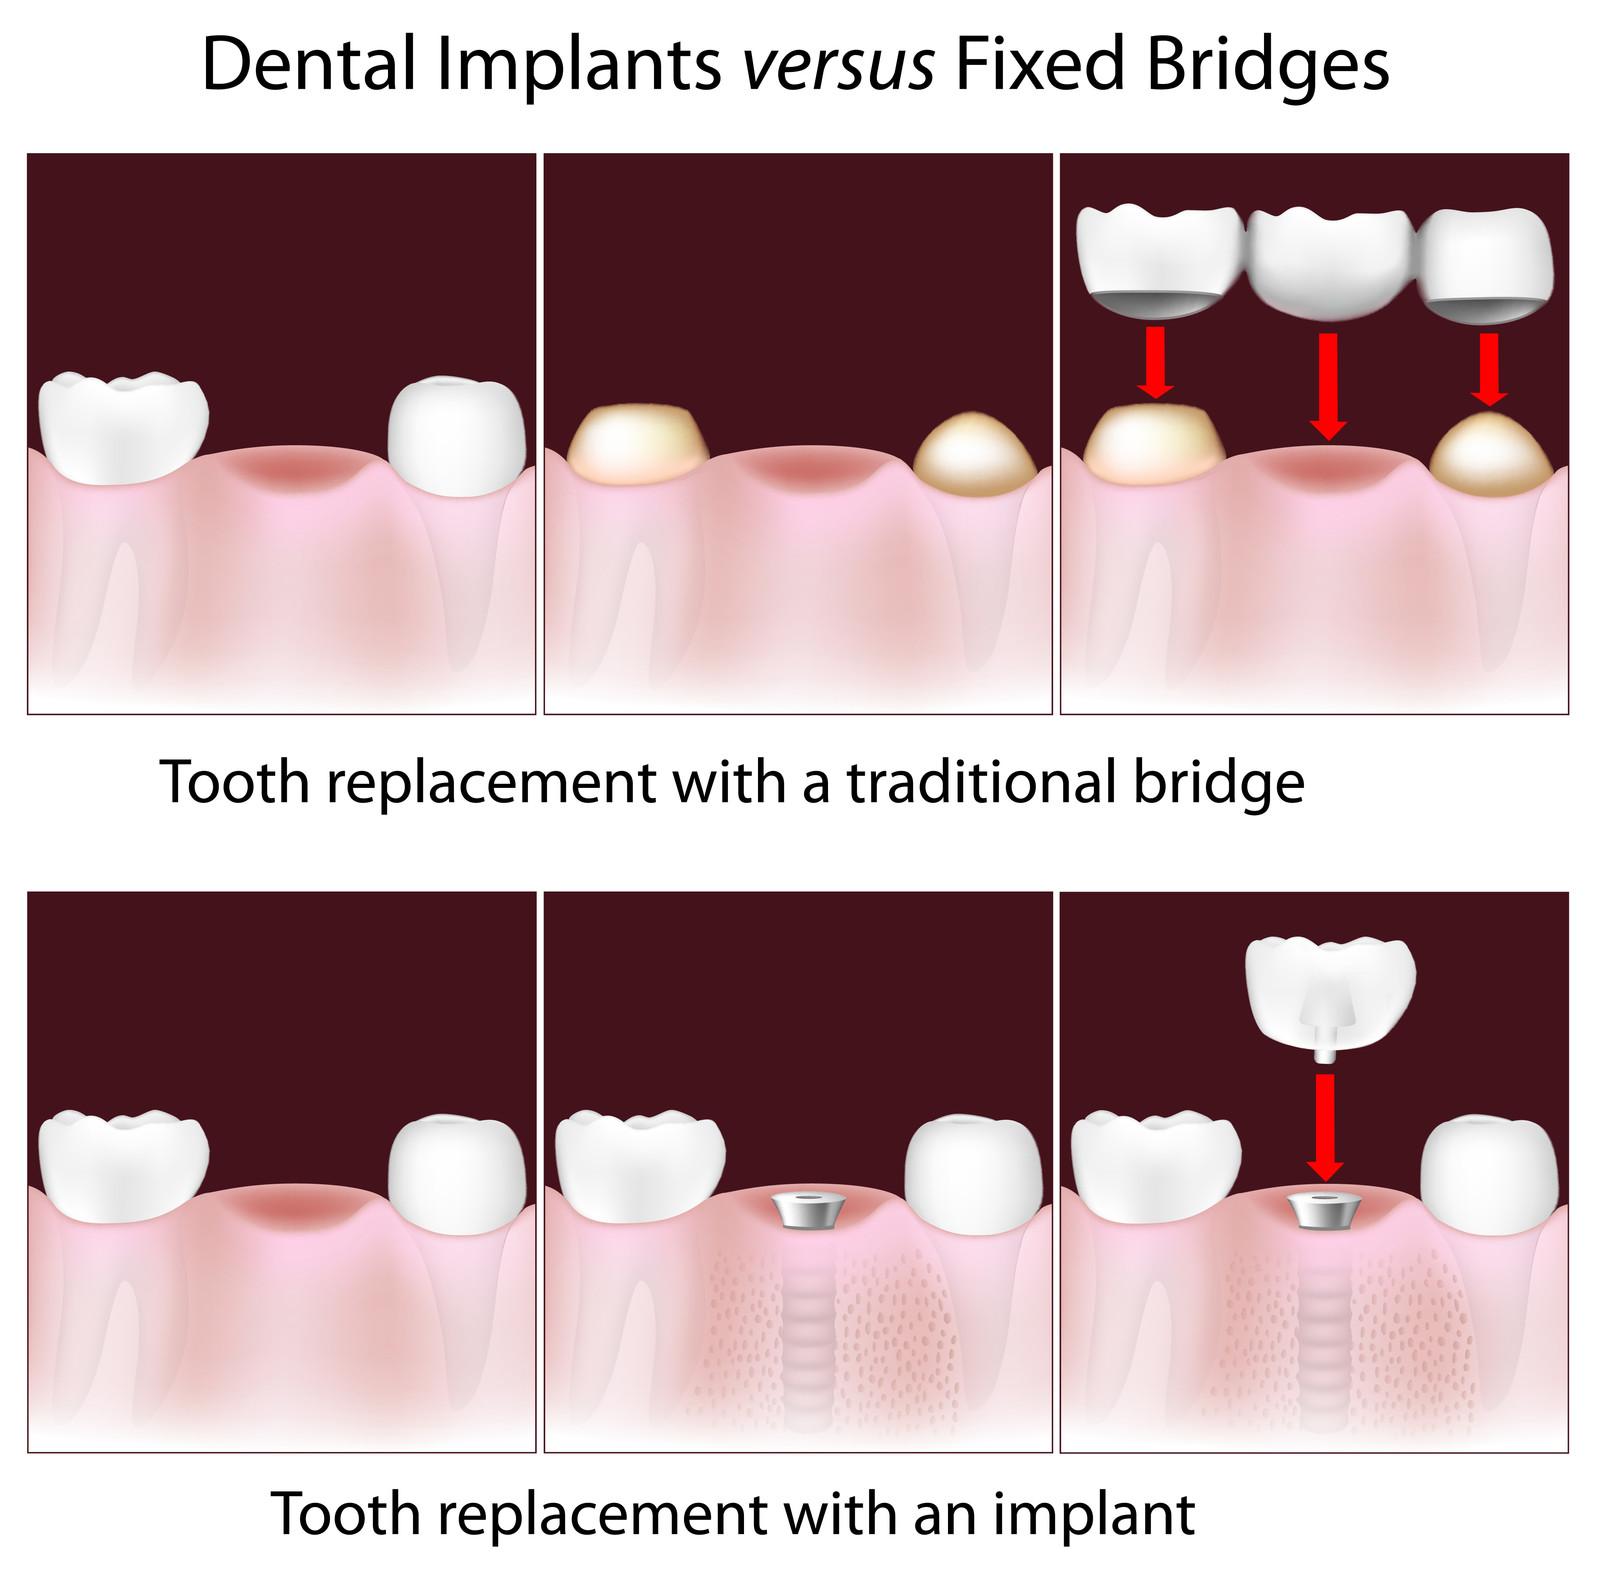 Fig 2. Implants Vs. Fixed Bridges